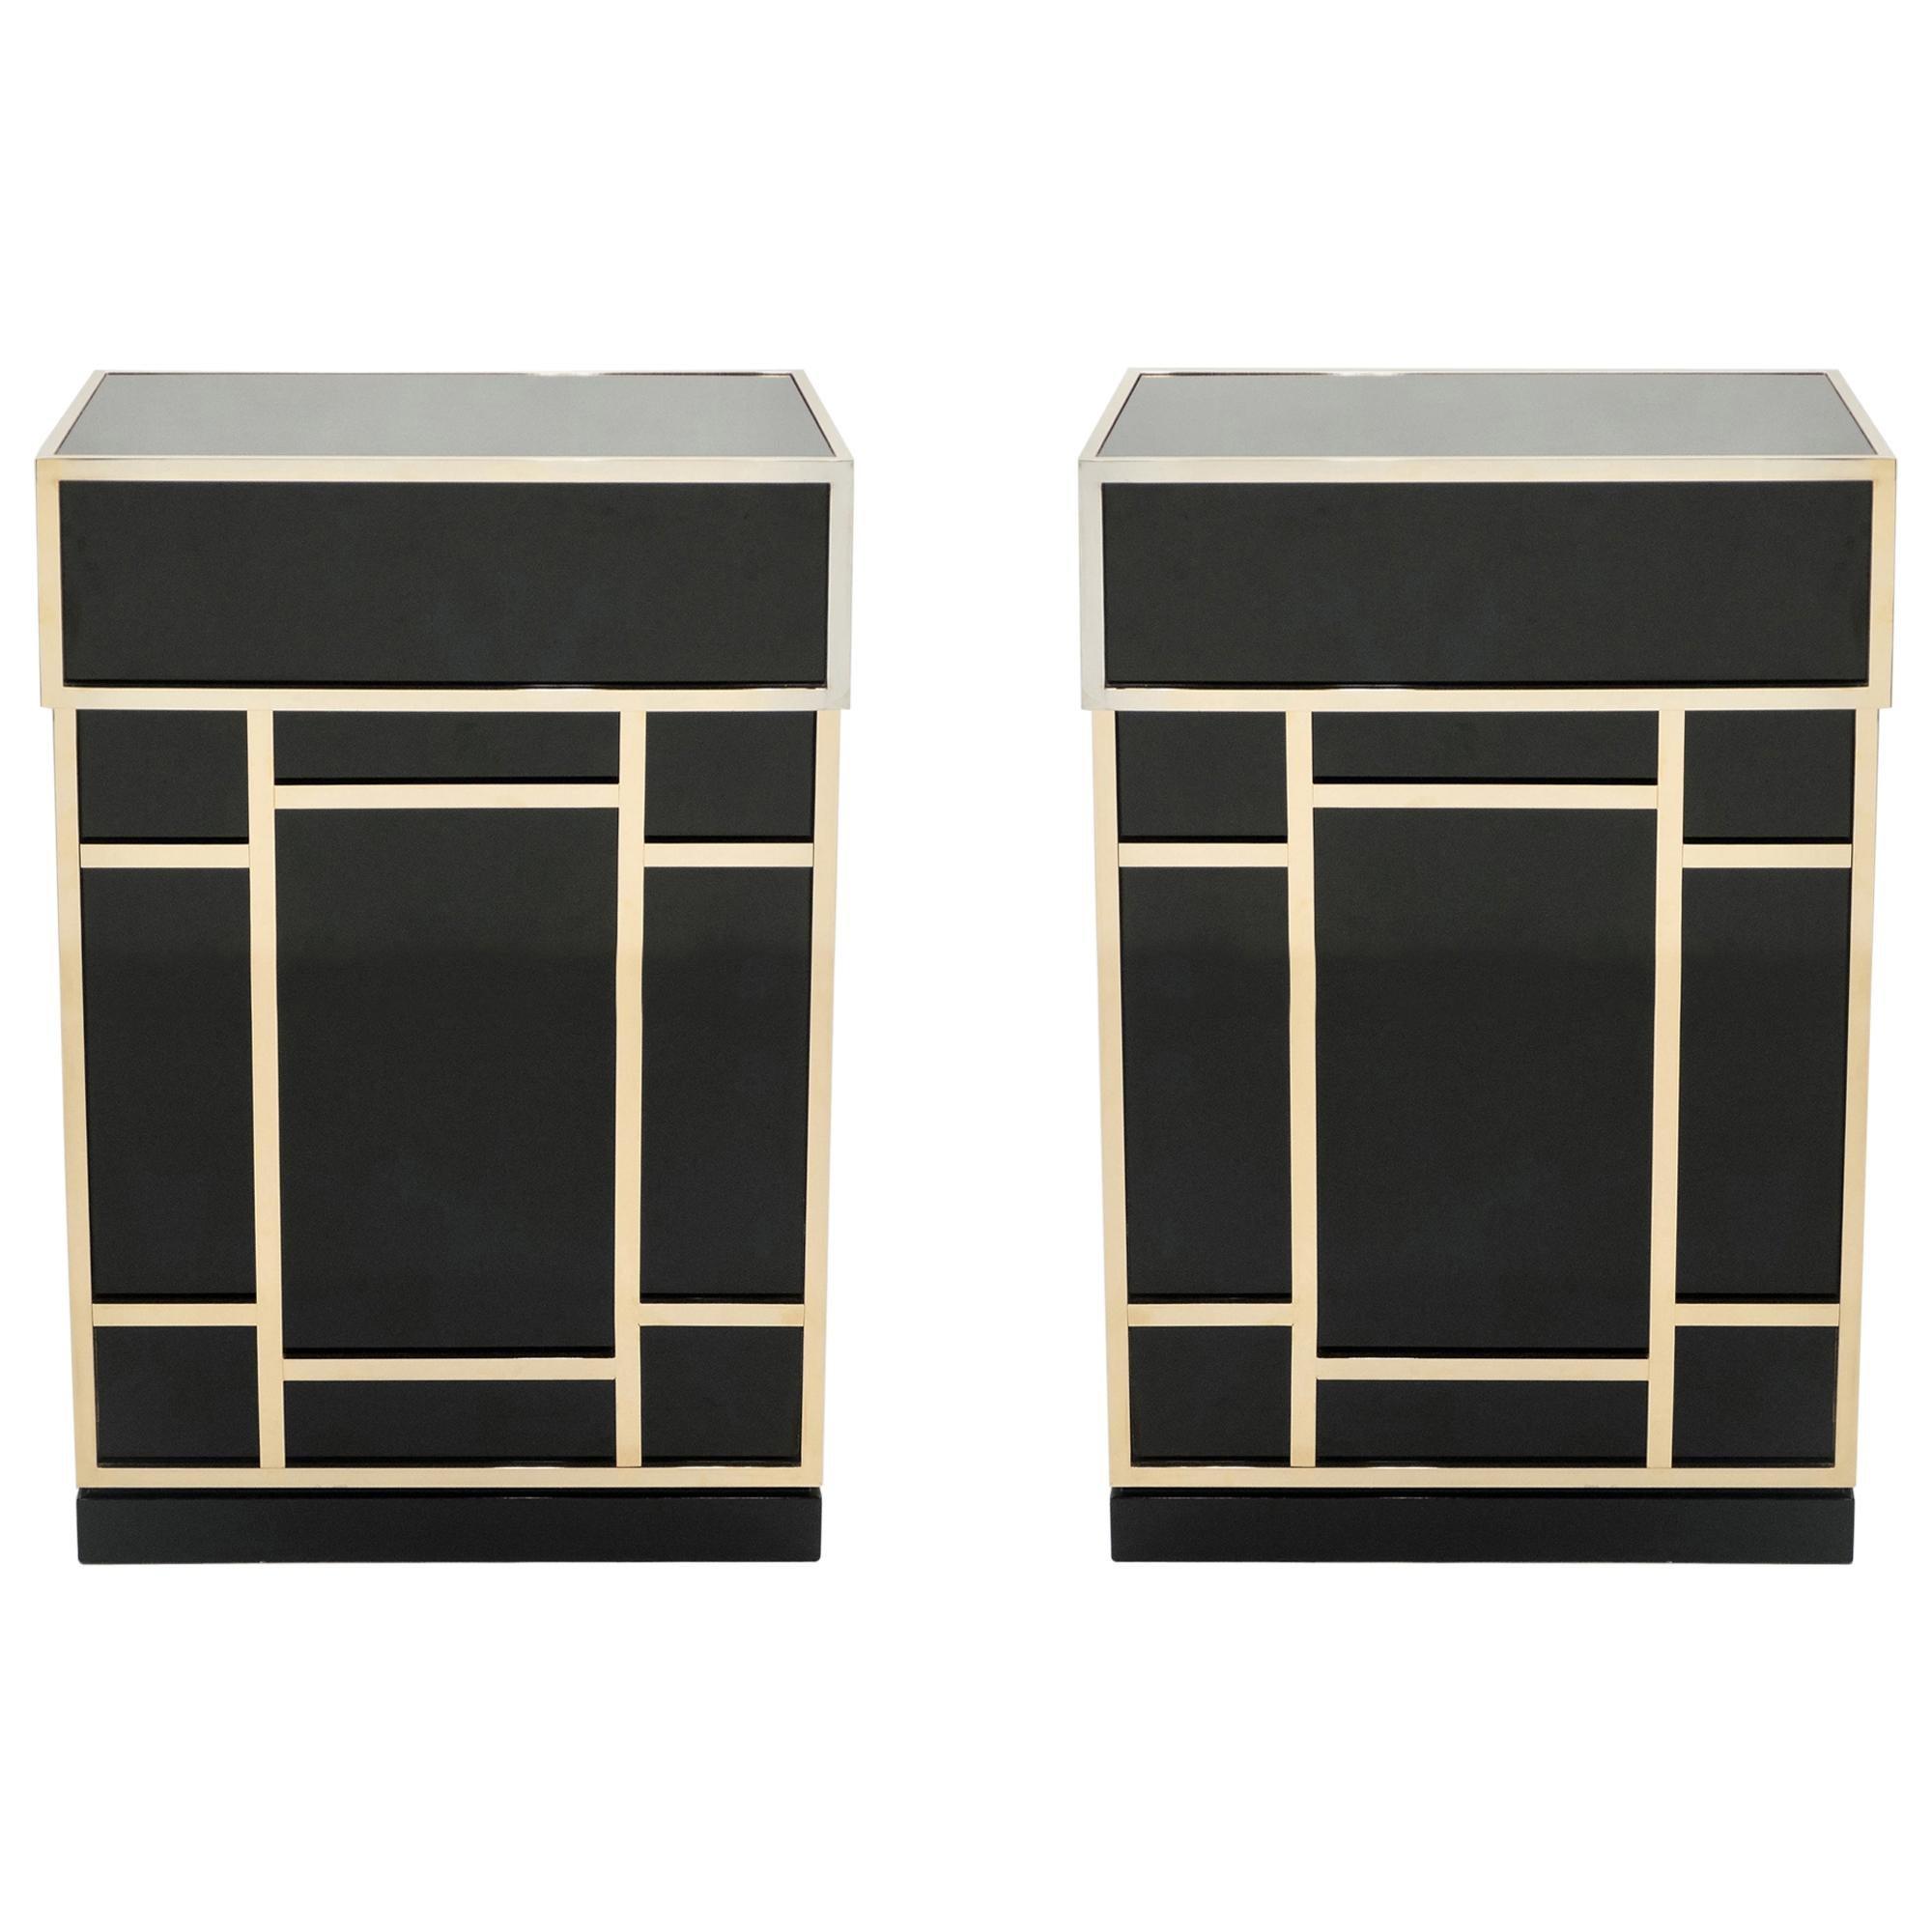 Pair of Maison Jansen Brass Black Lacquered Dry Bar Elements, 1970s